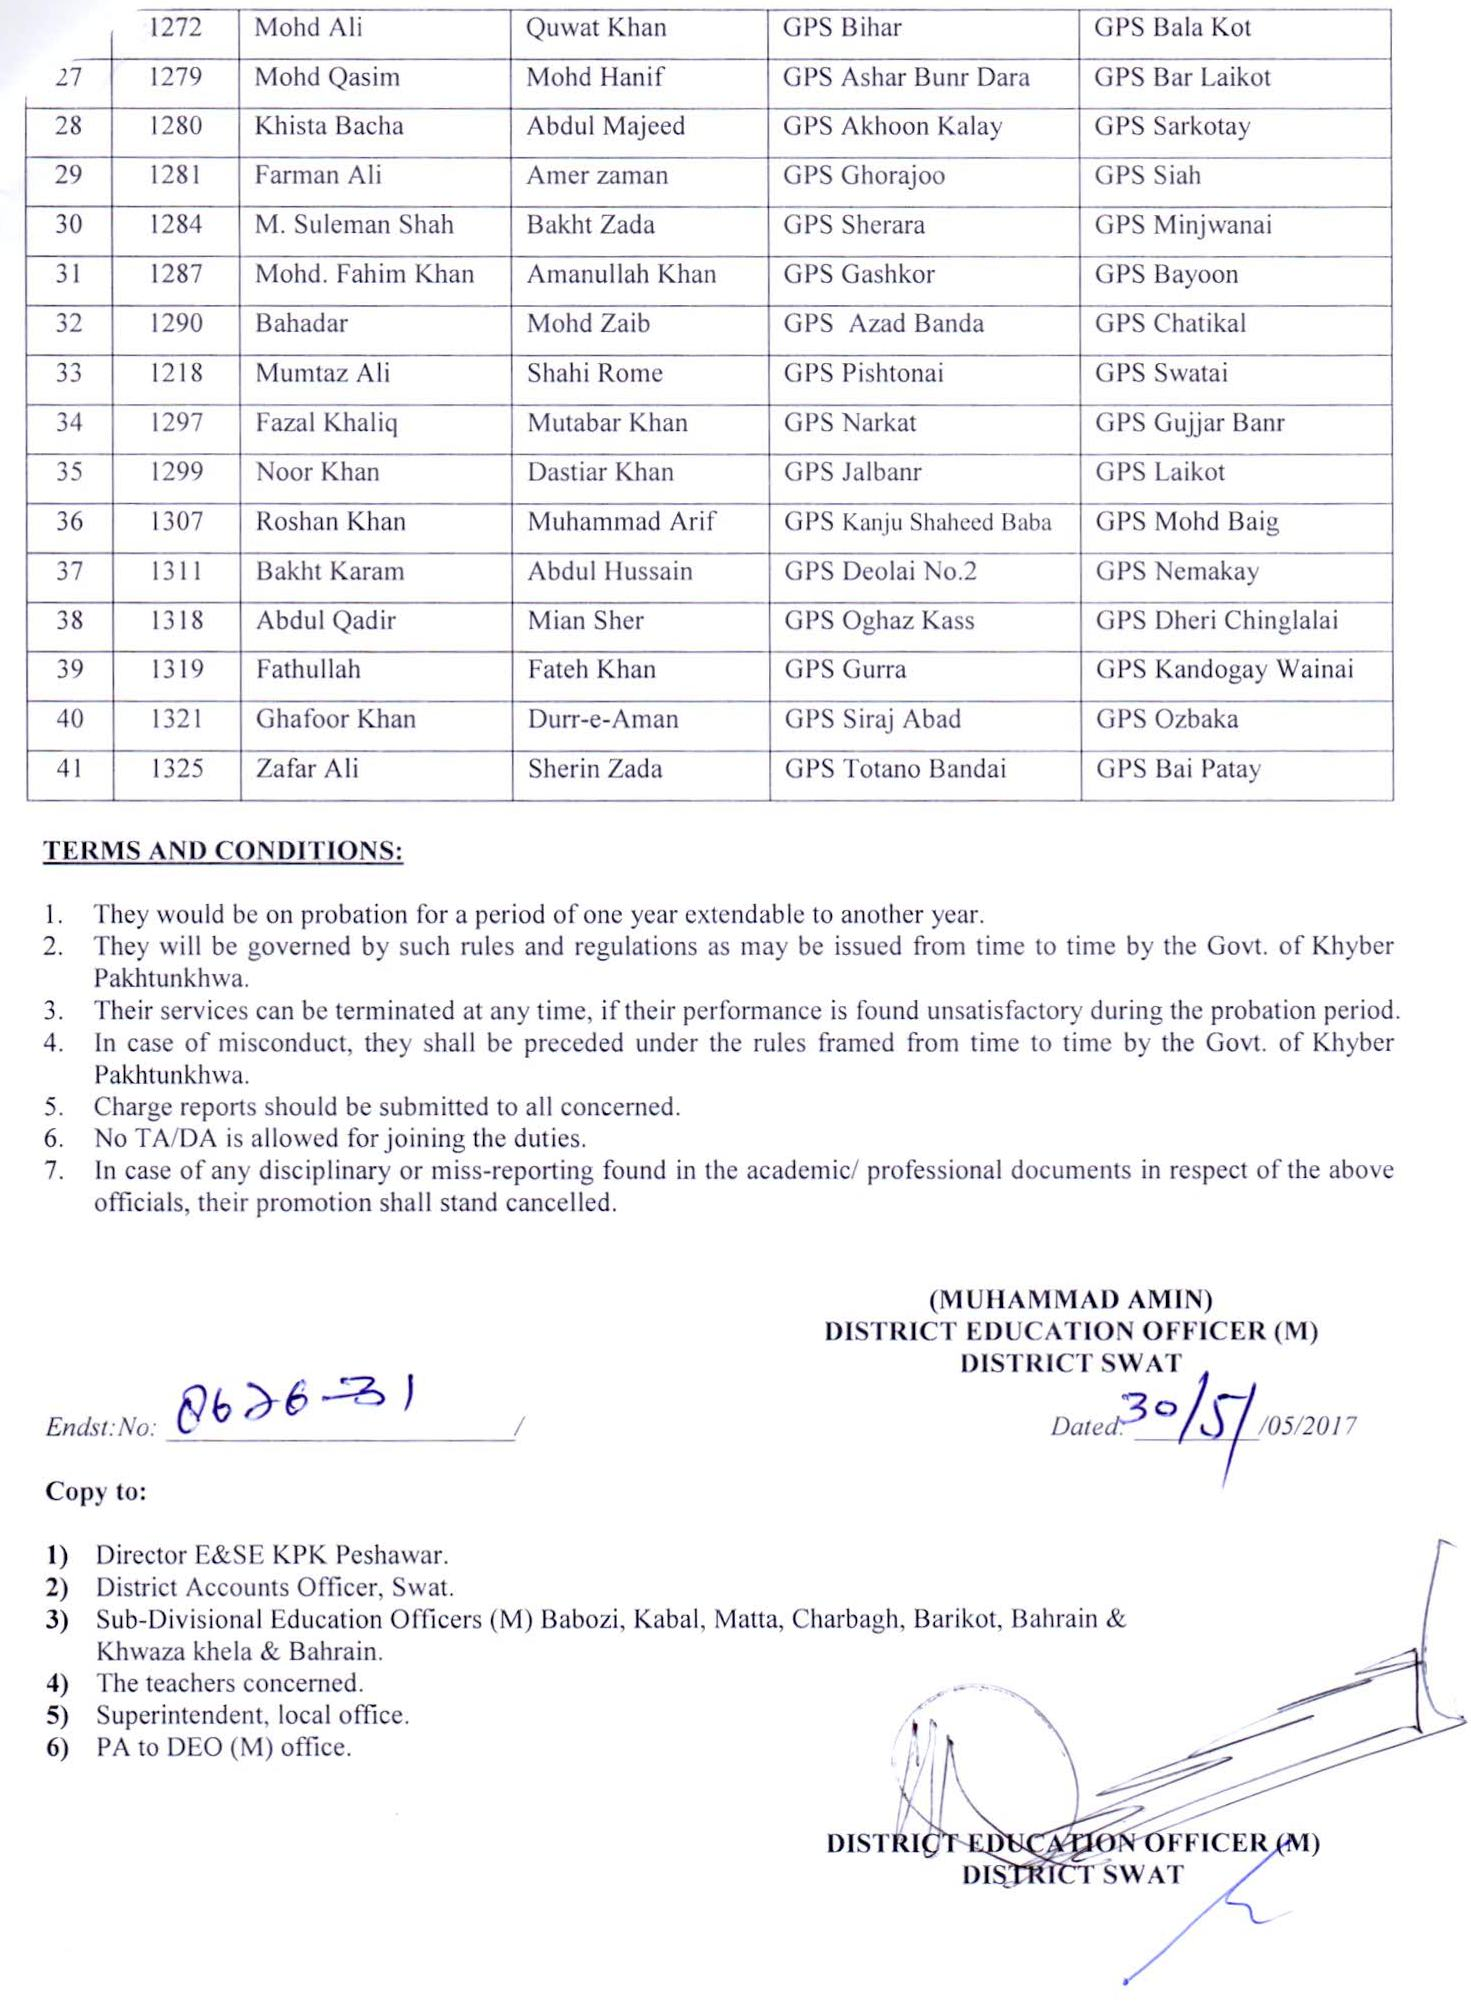 DEO Swat Office Notification